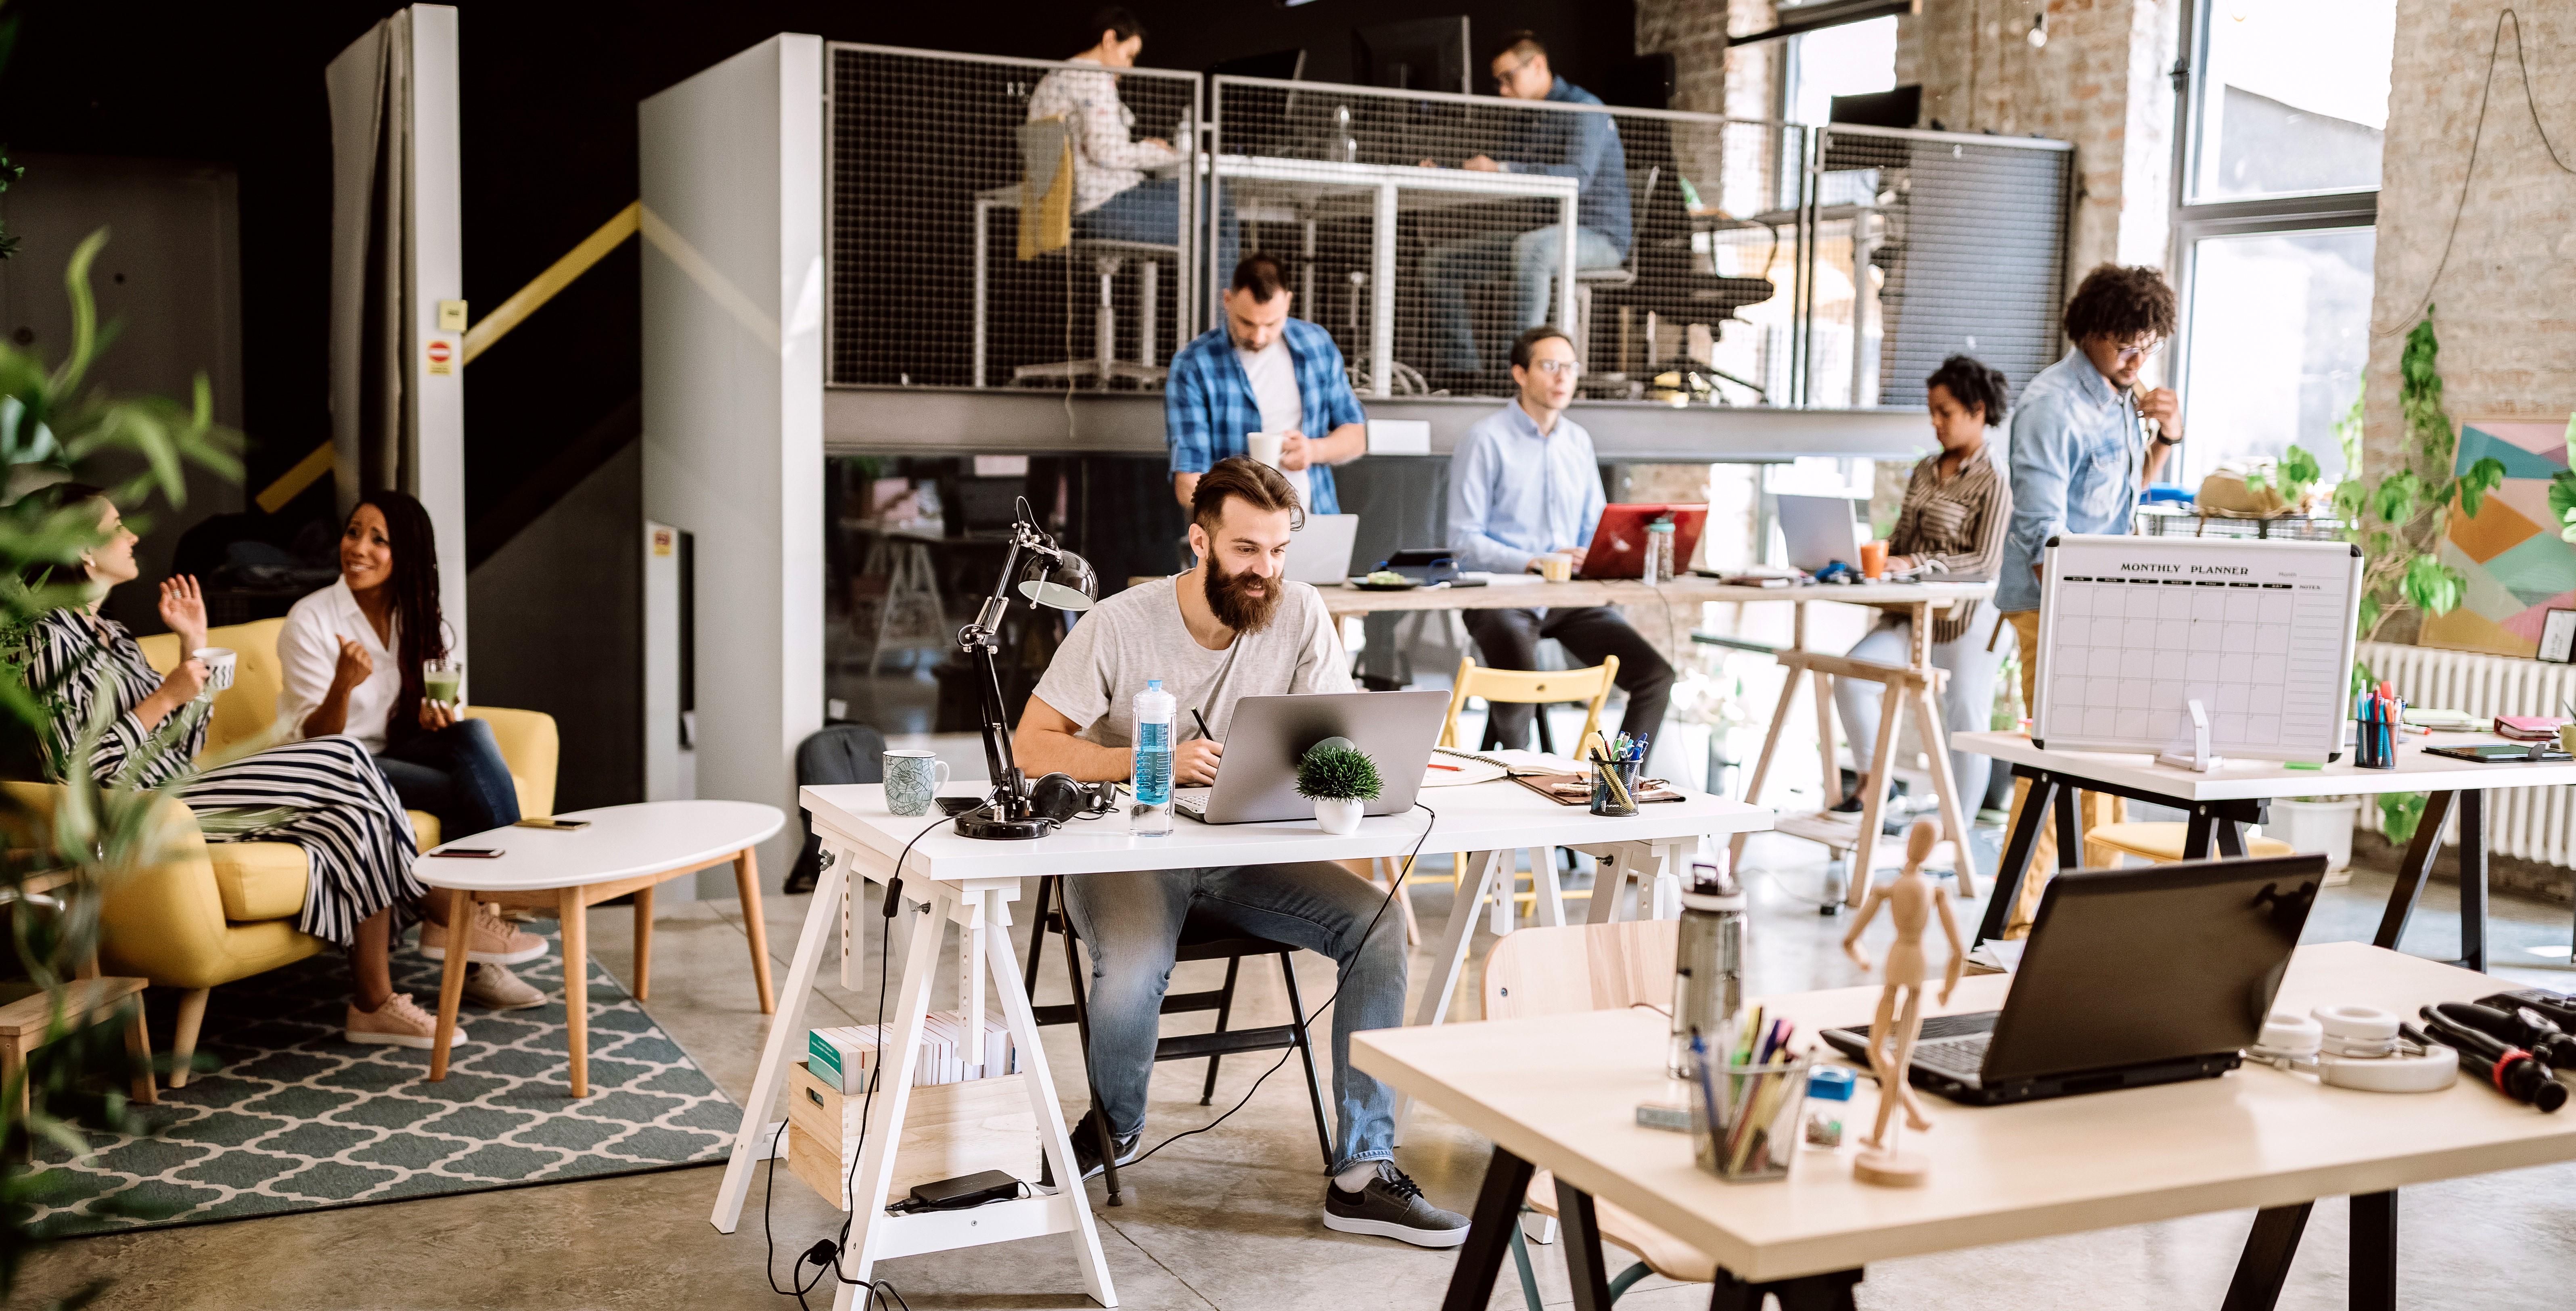 Should Swiss companies build an 'alternative' workforce?